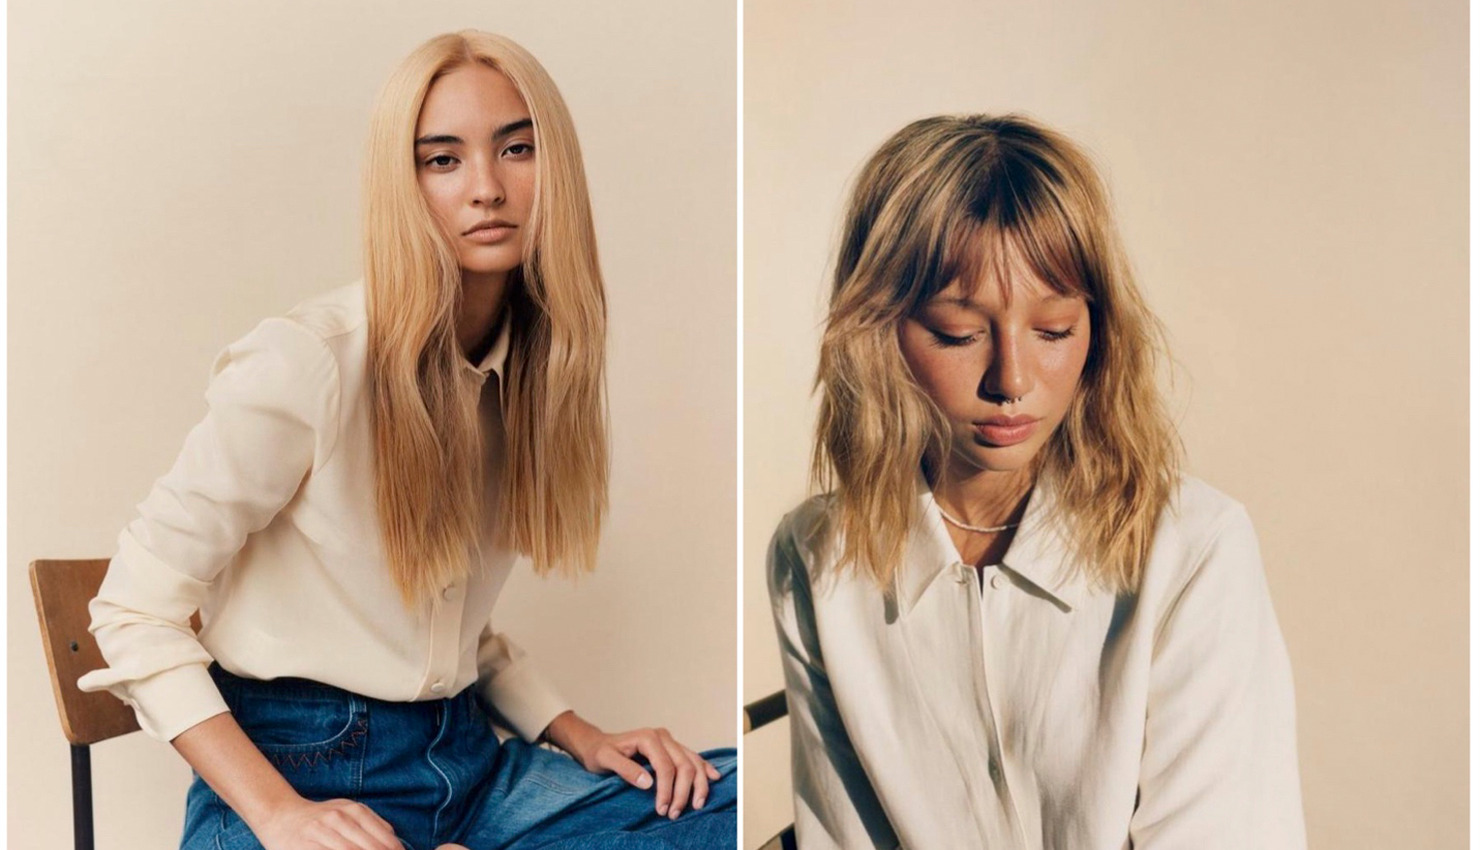 heart-of-glass-cabello-reparar-verano-magazinehorse